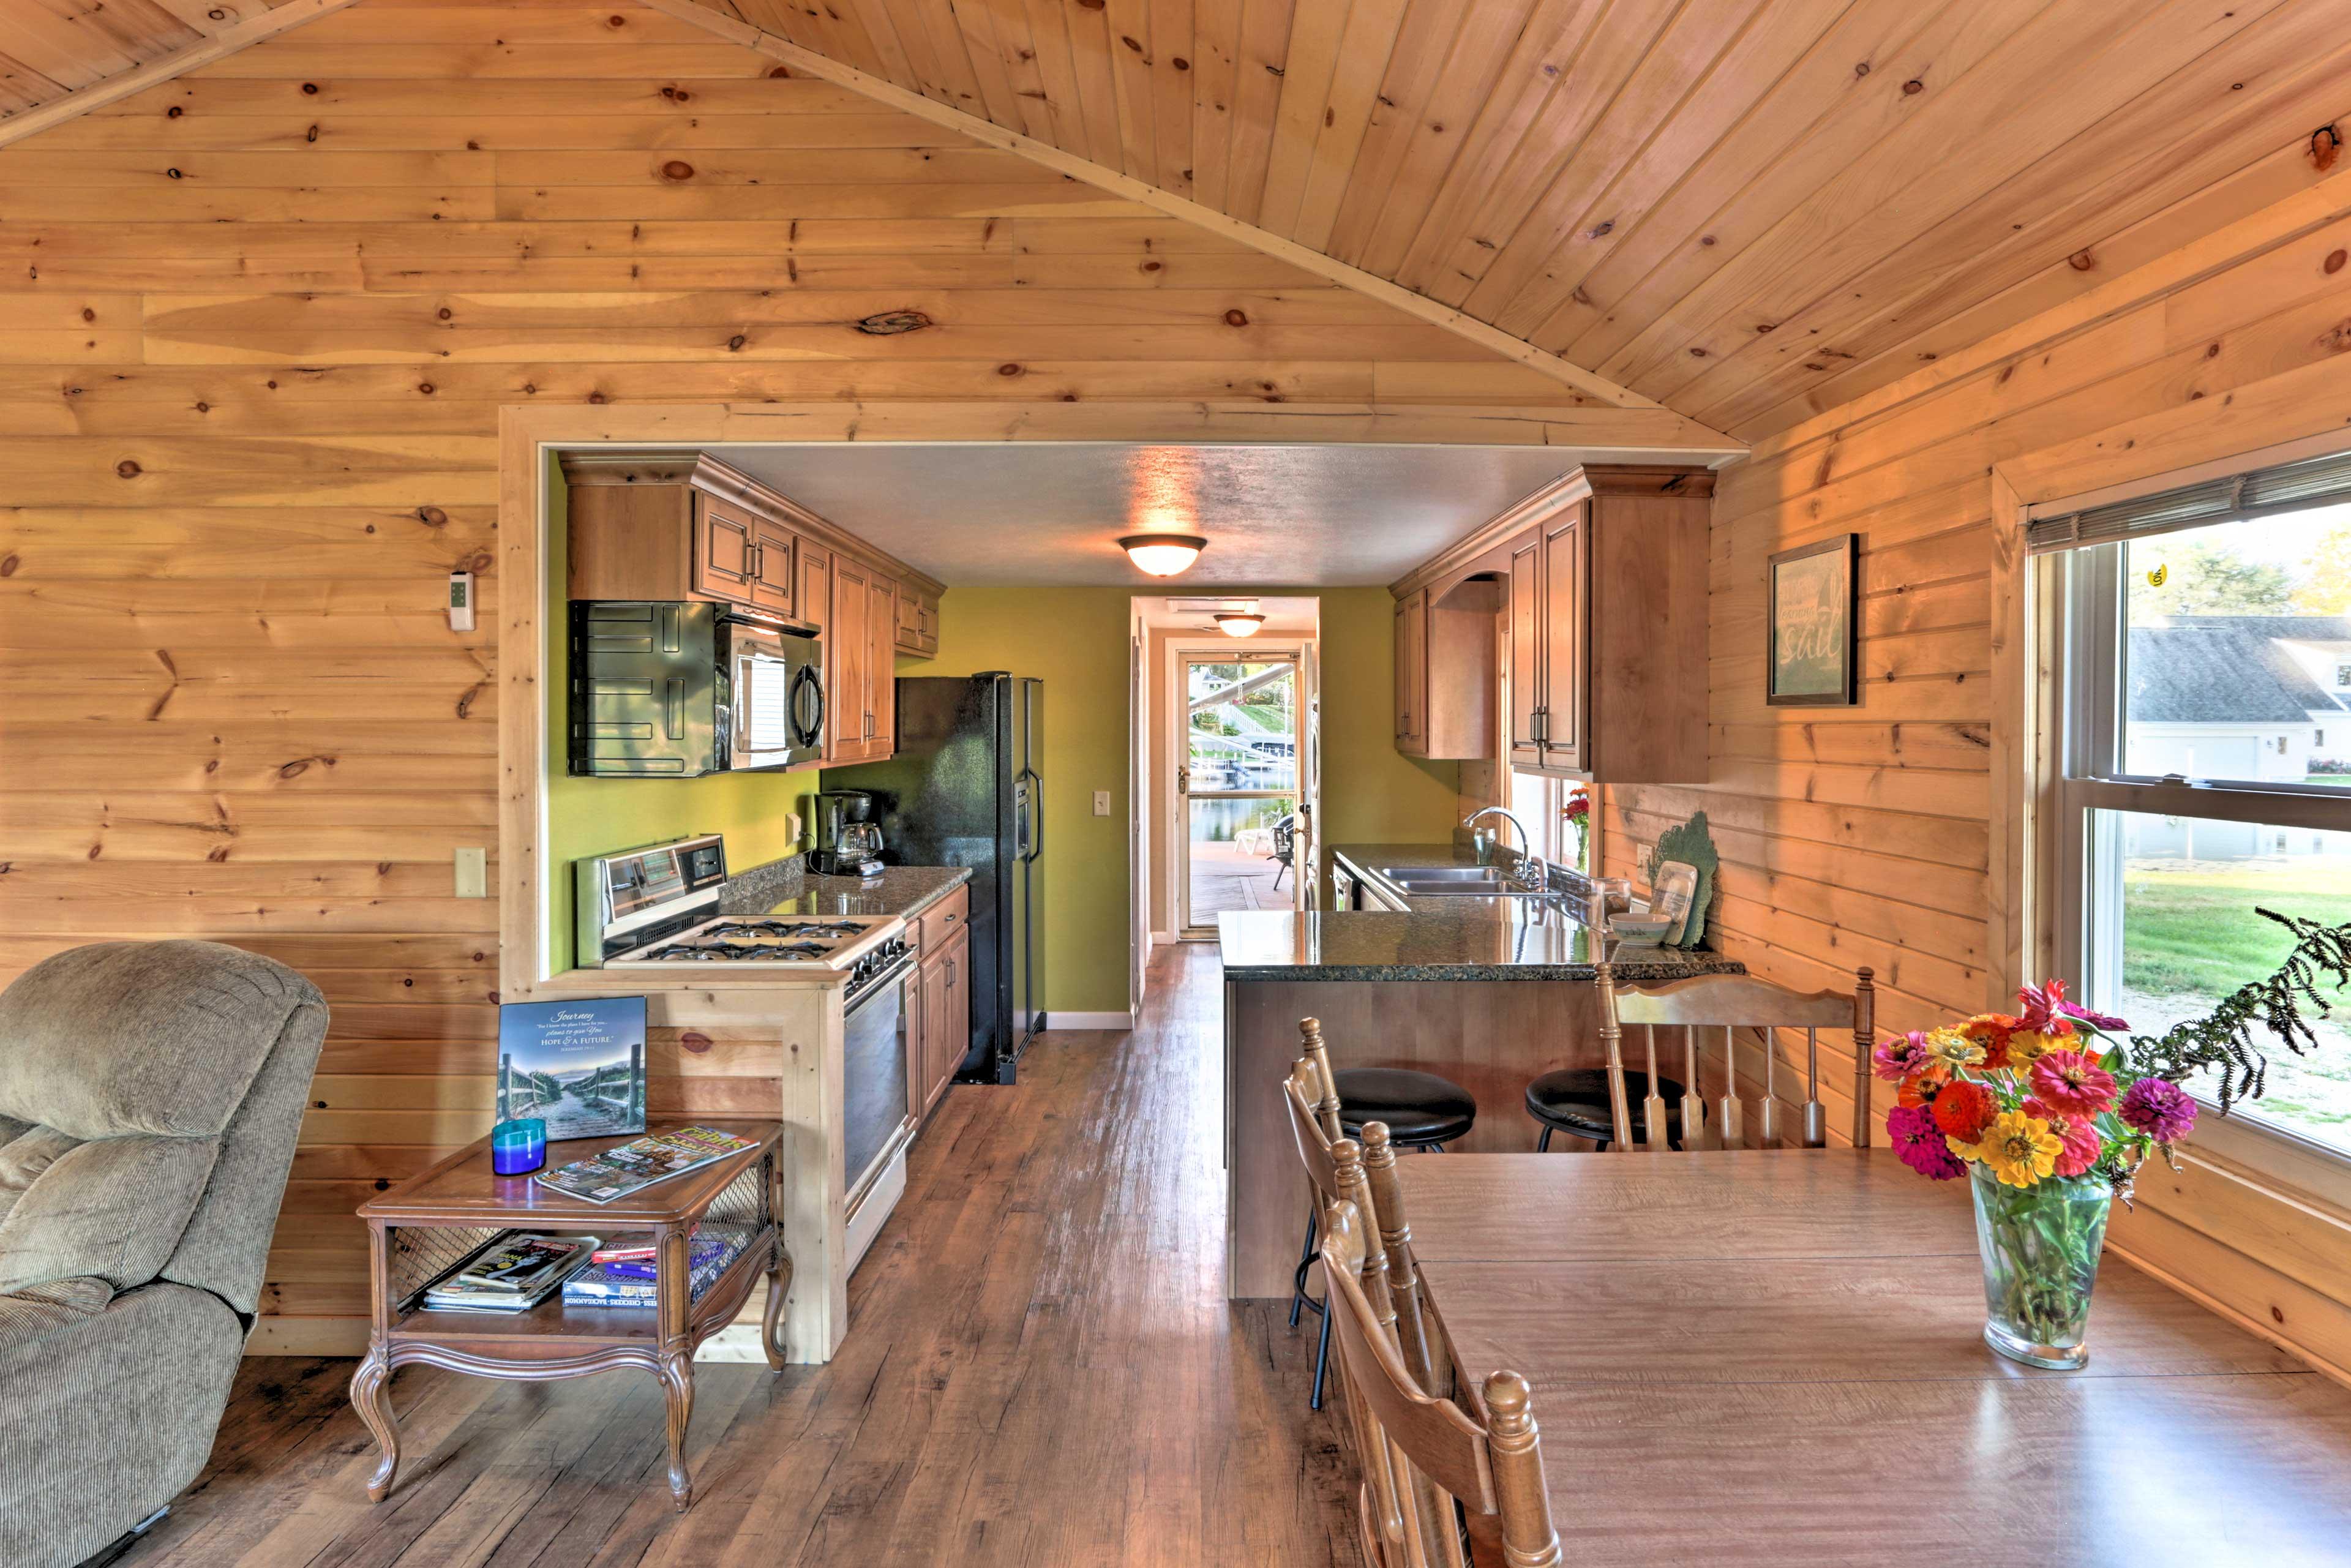 Breakfast Bar Seating for 2 | Kitchen & Living Room